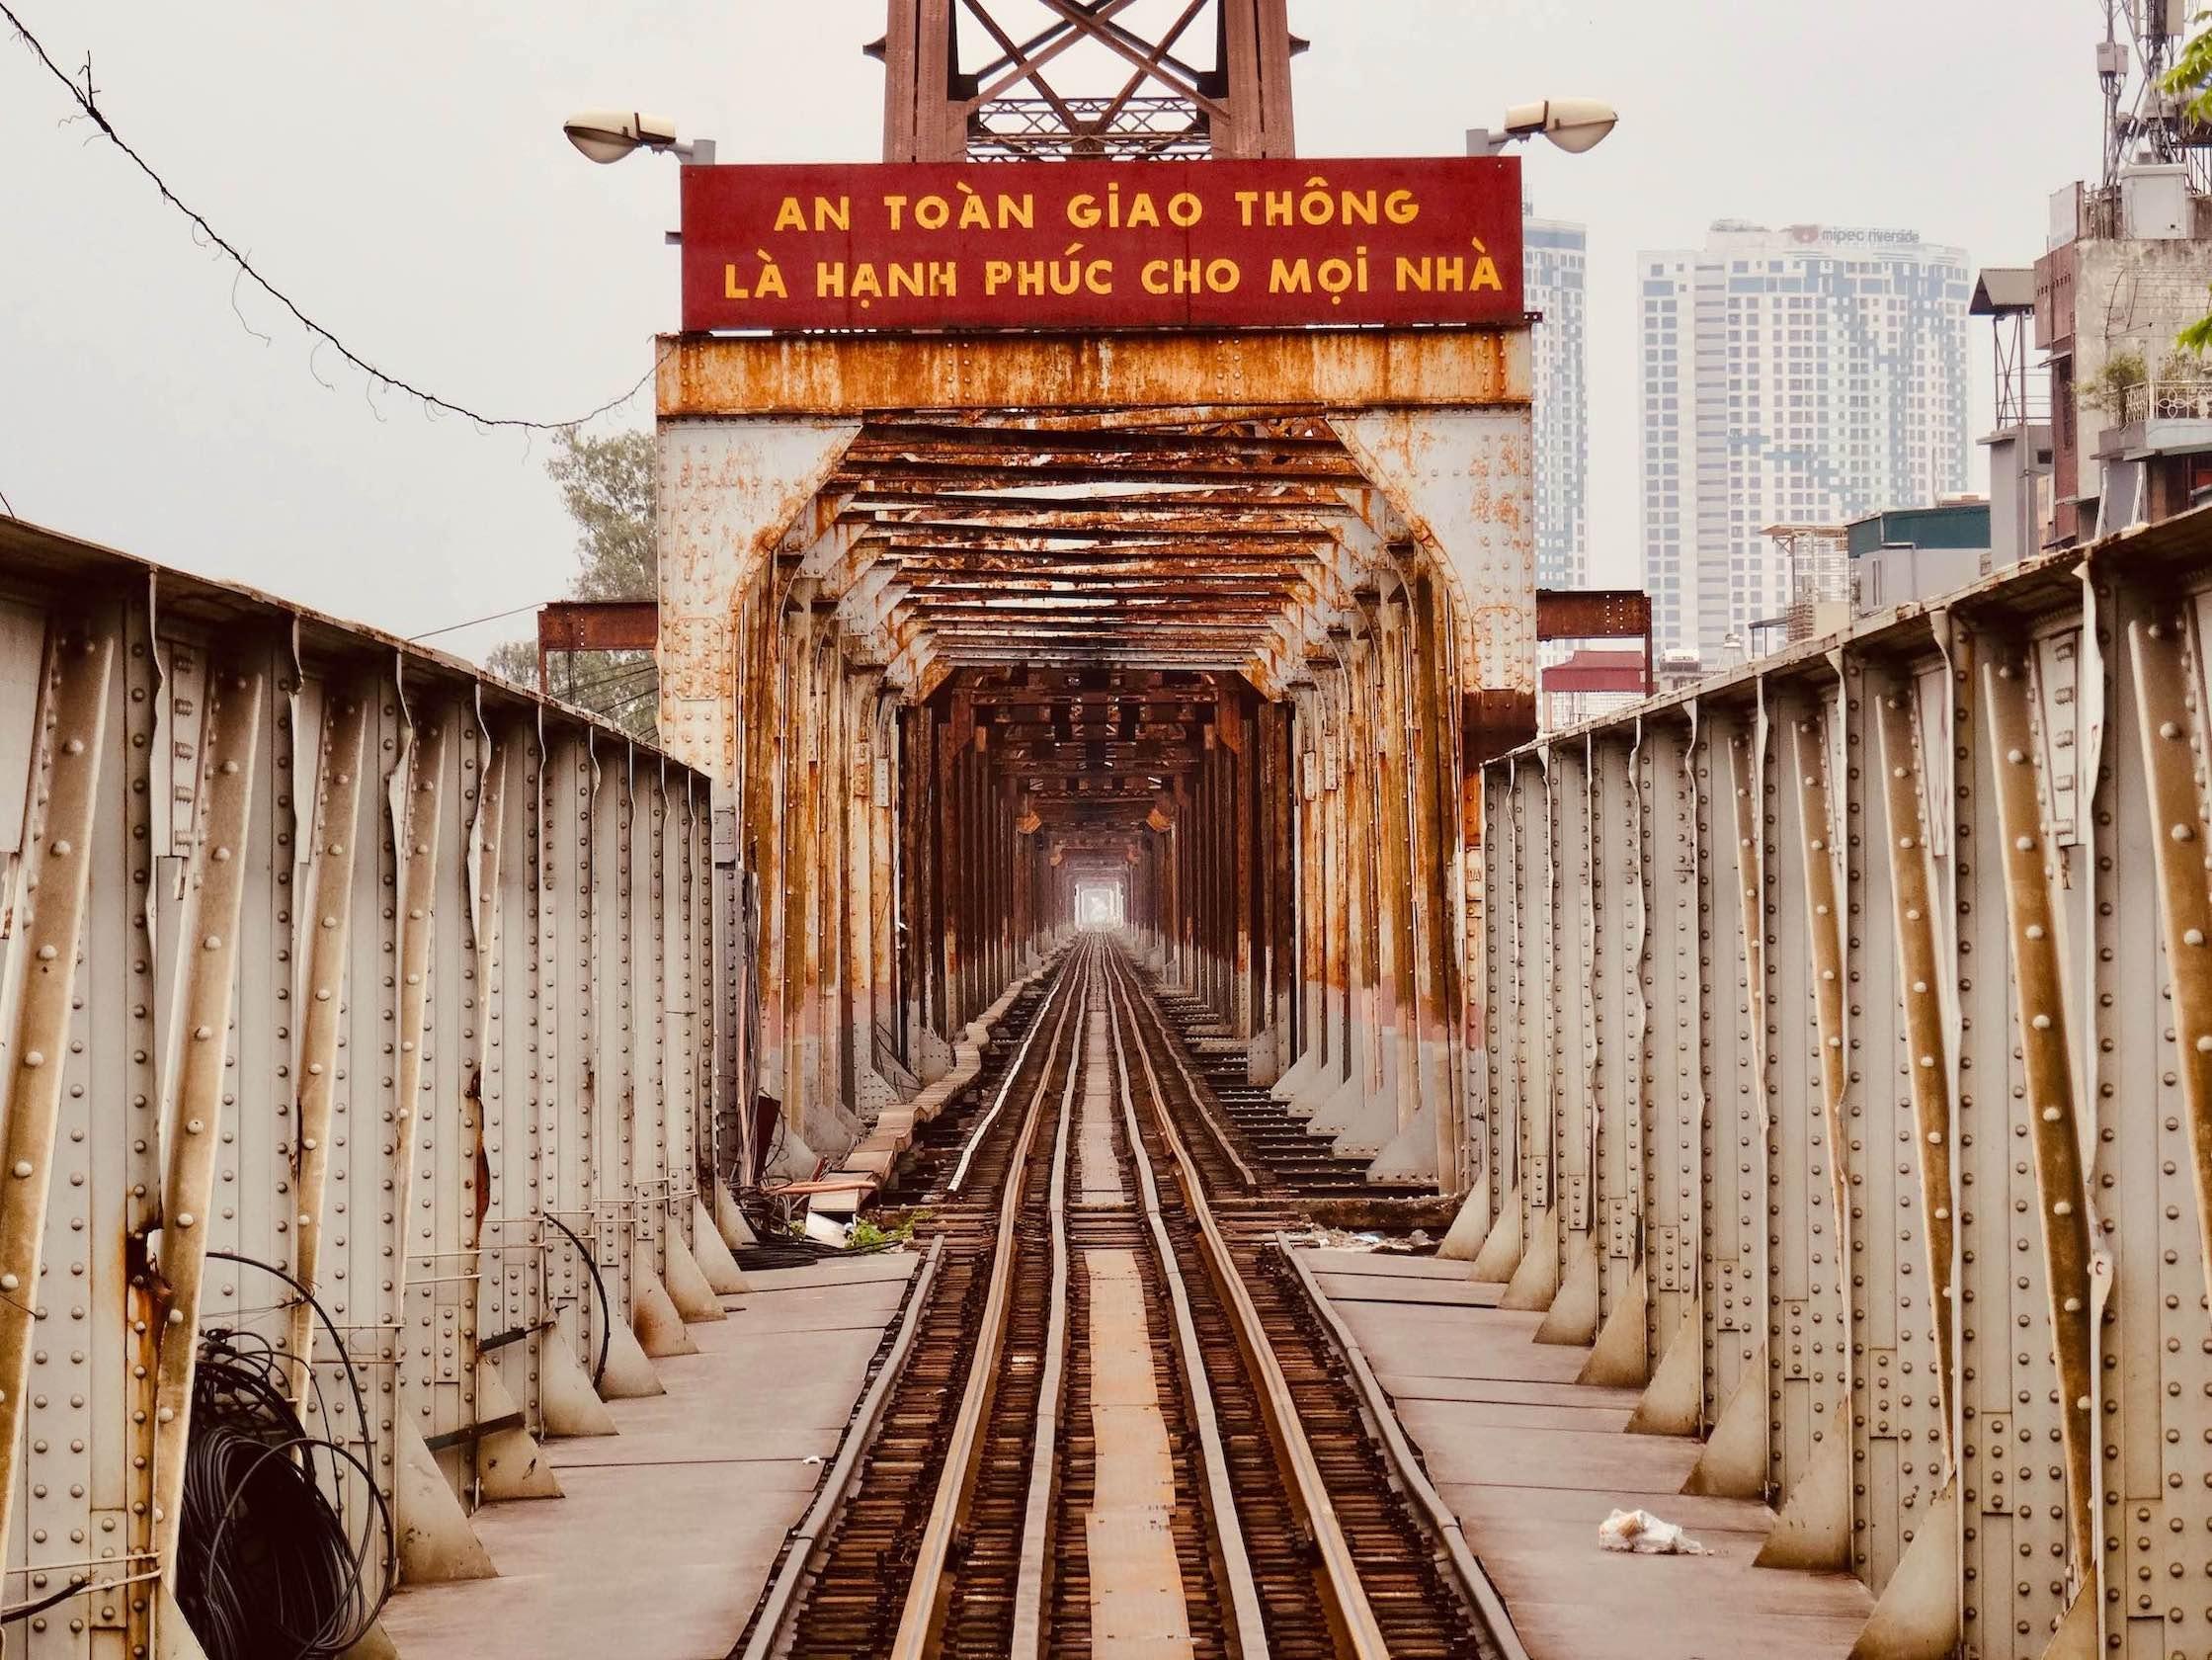 Long Bien Railway Bridge Hanoi.